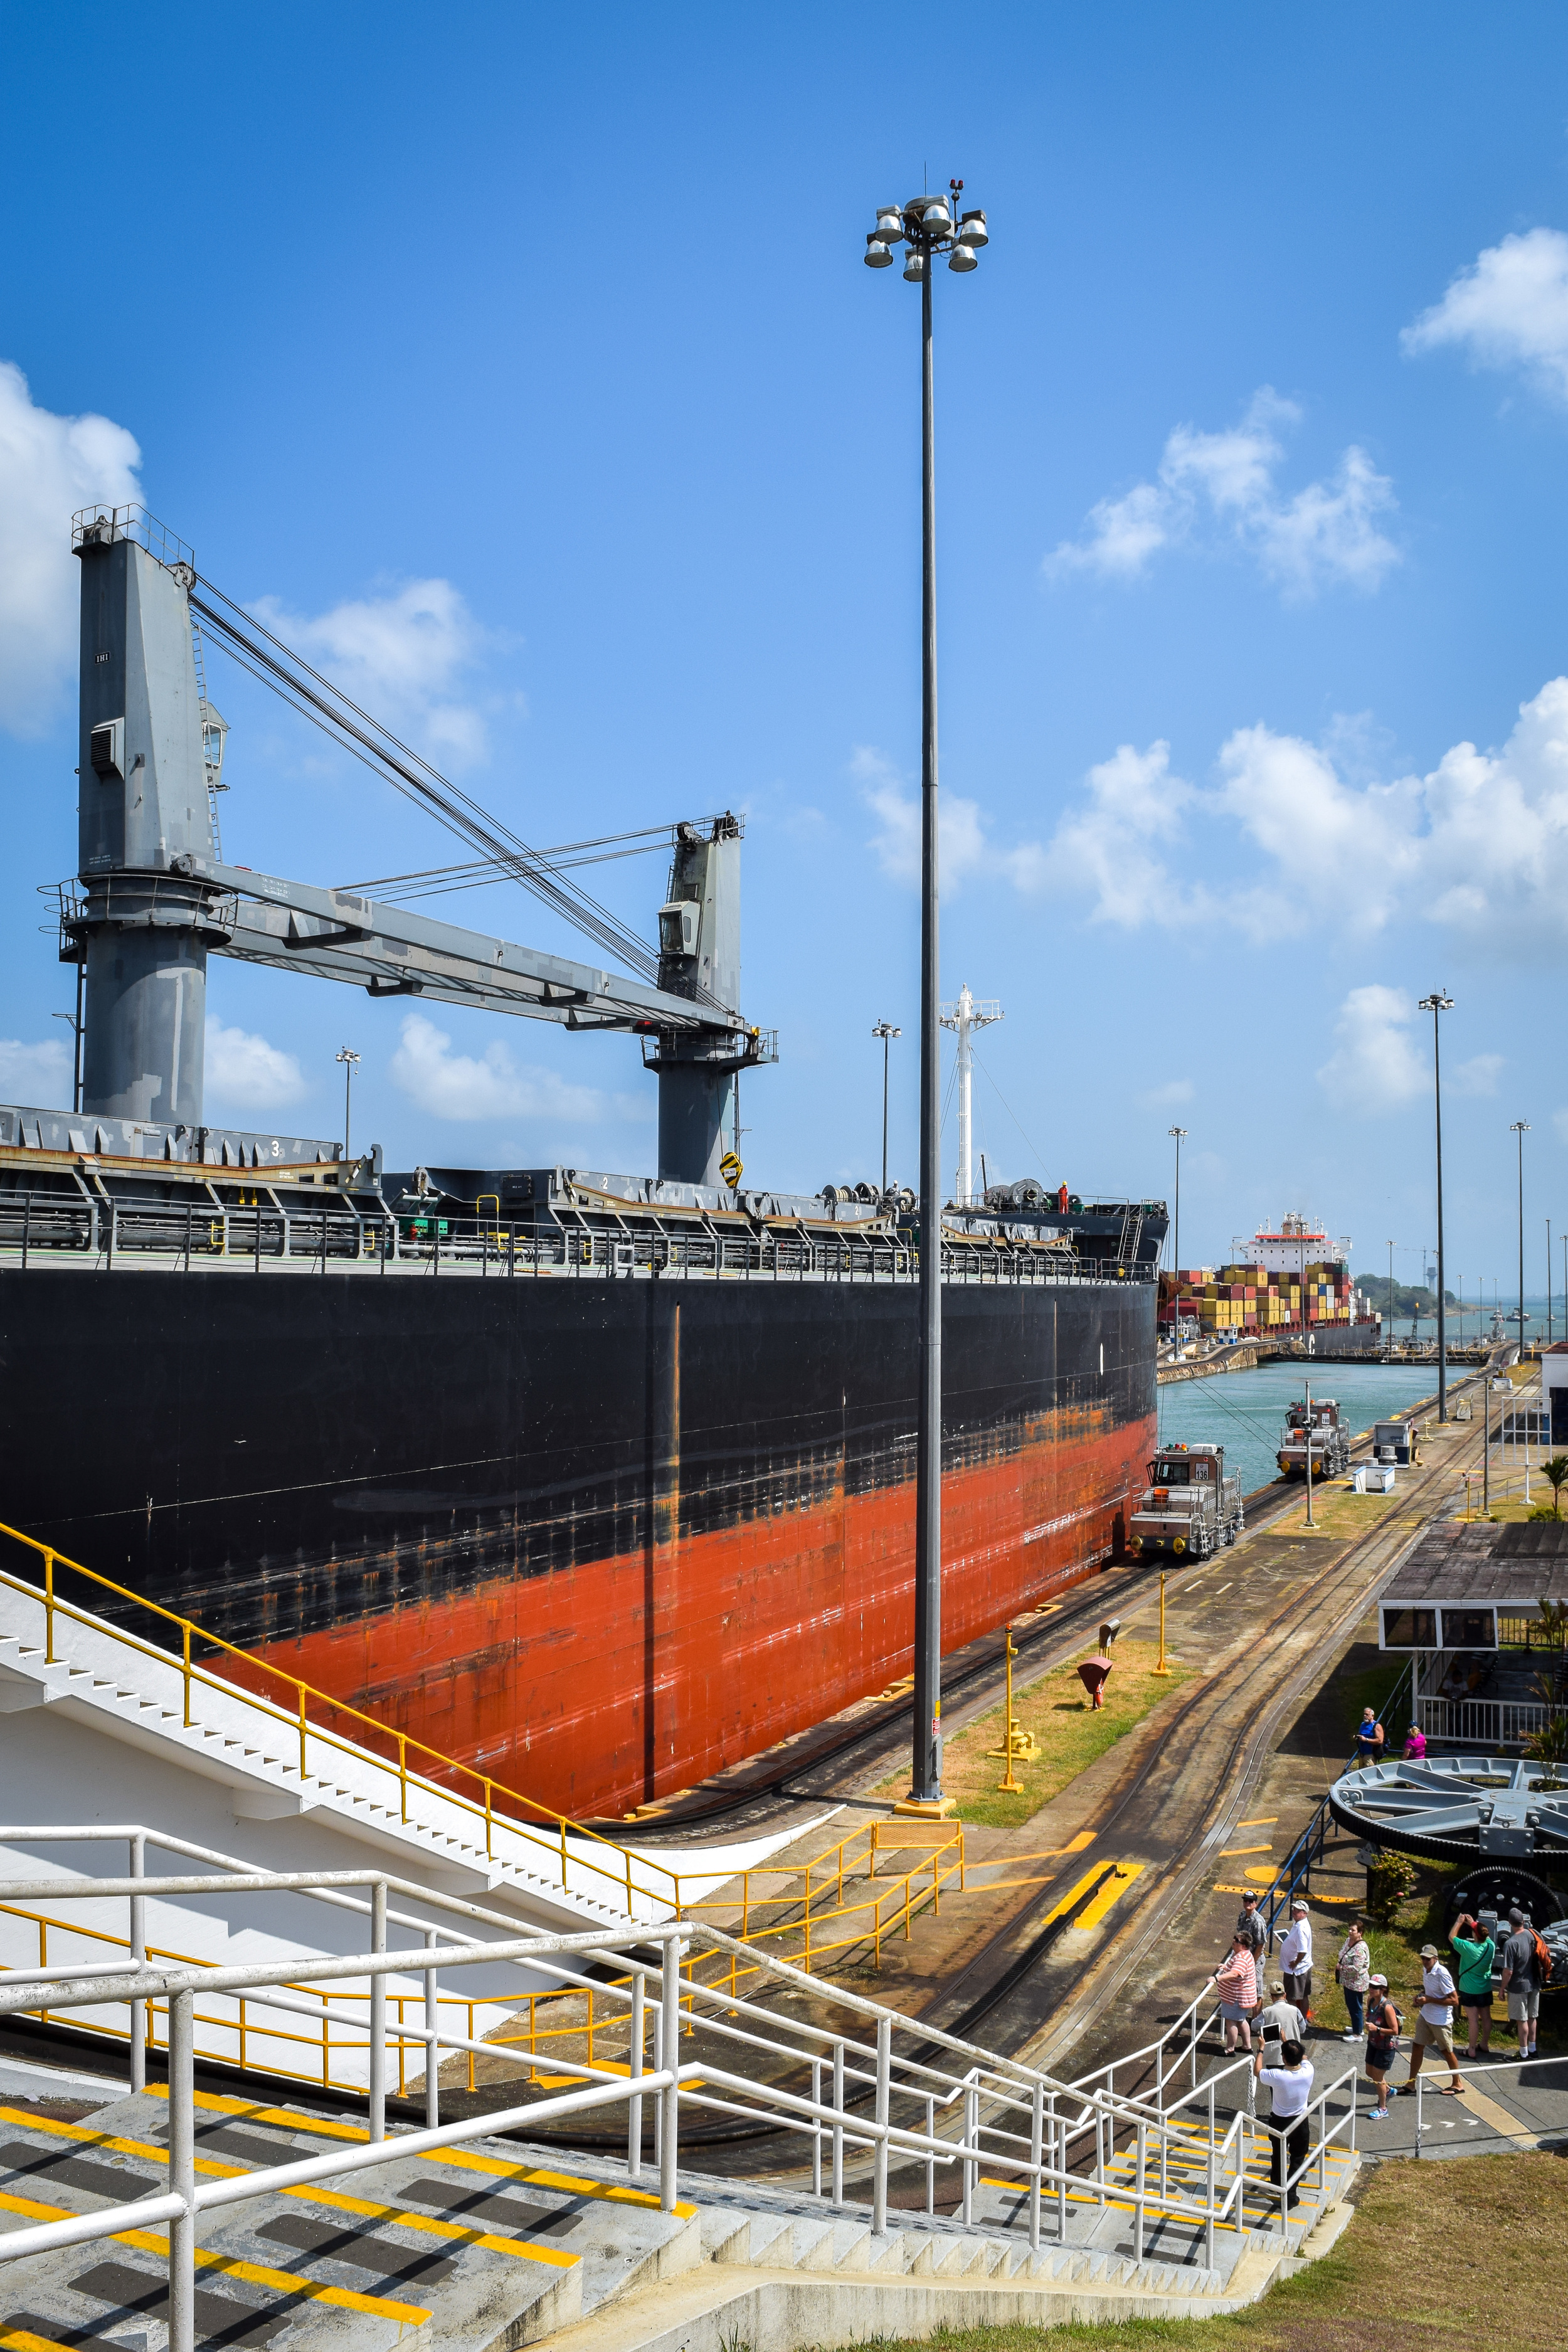 Ship transiting through the Panama Canal